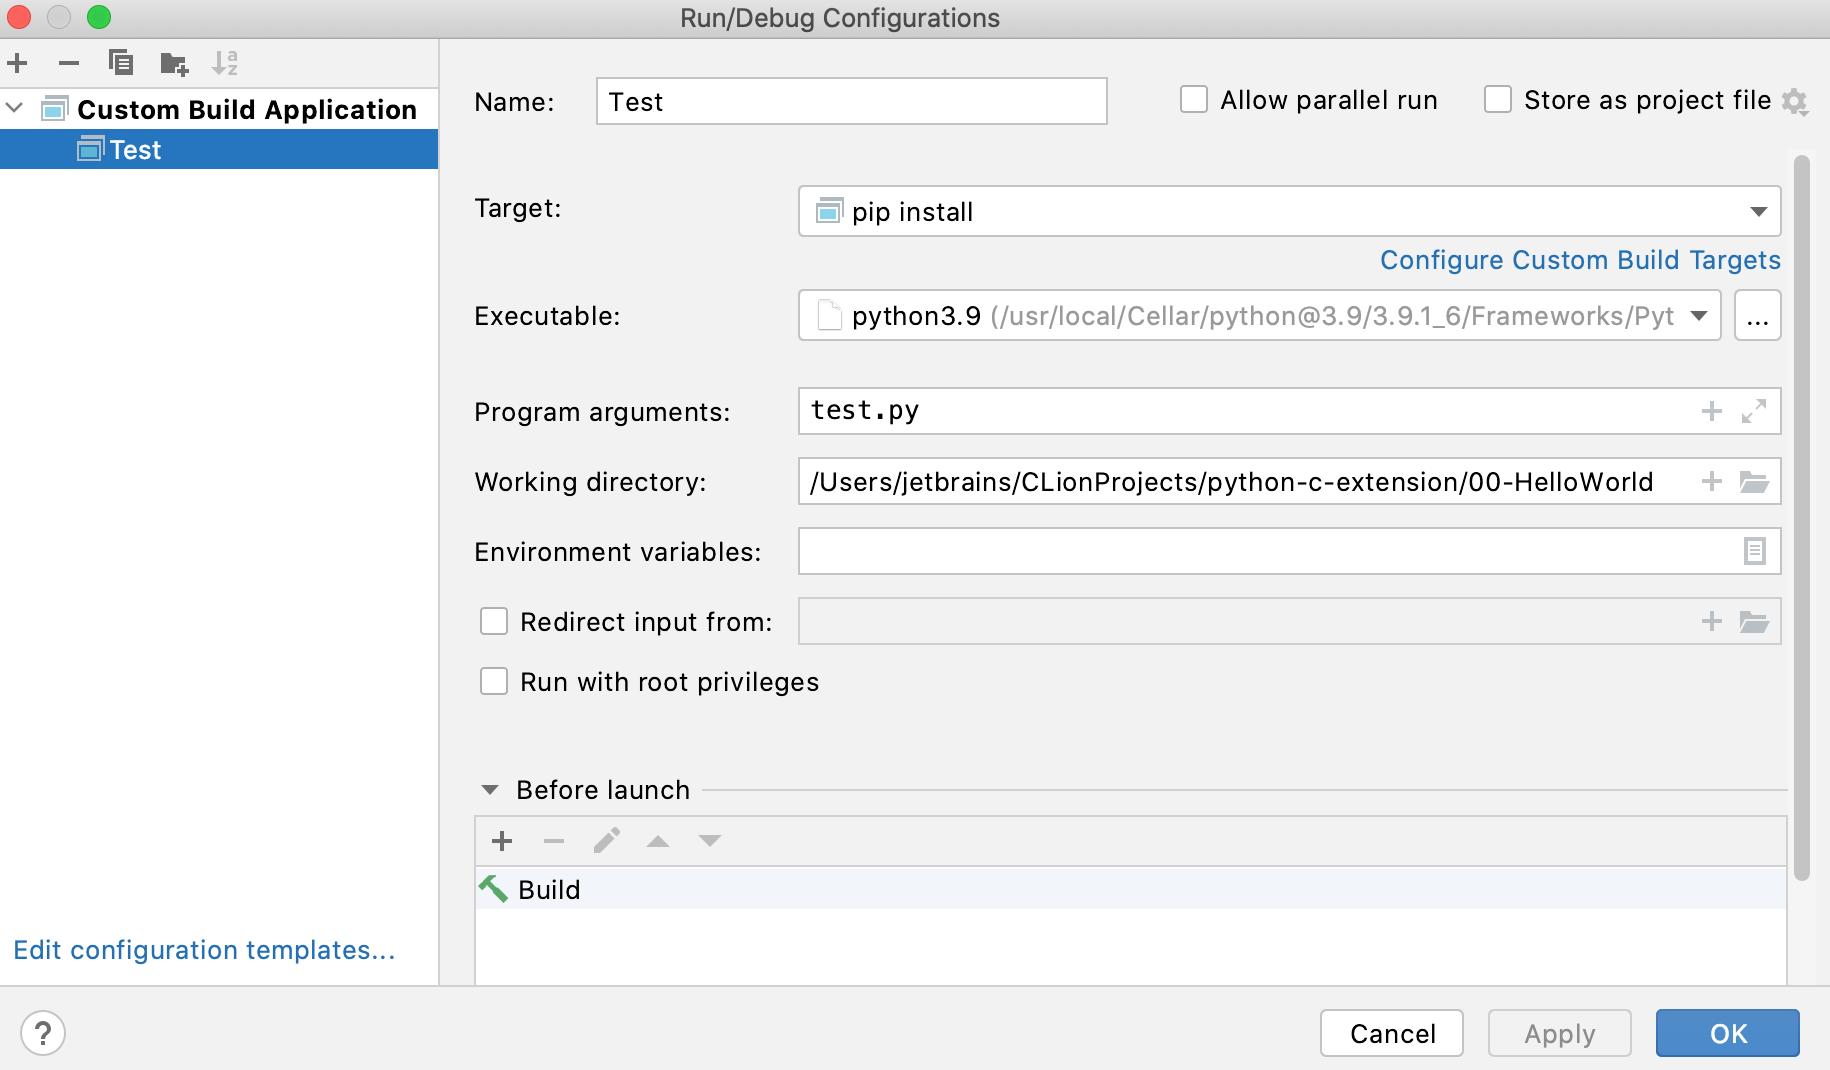 Custom Build Application